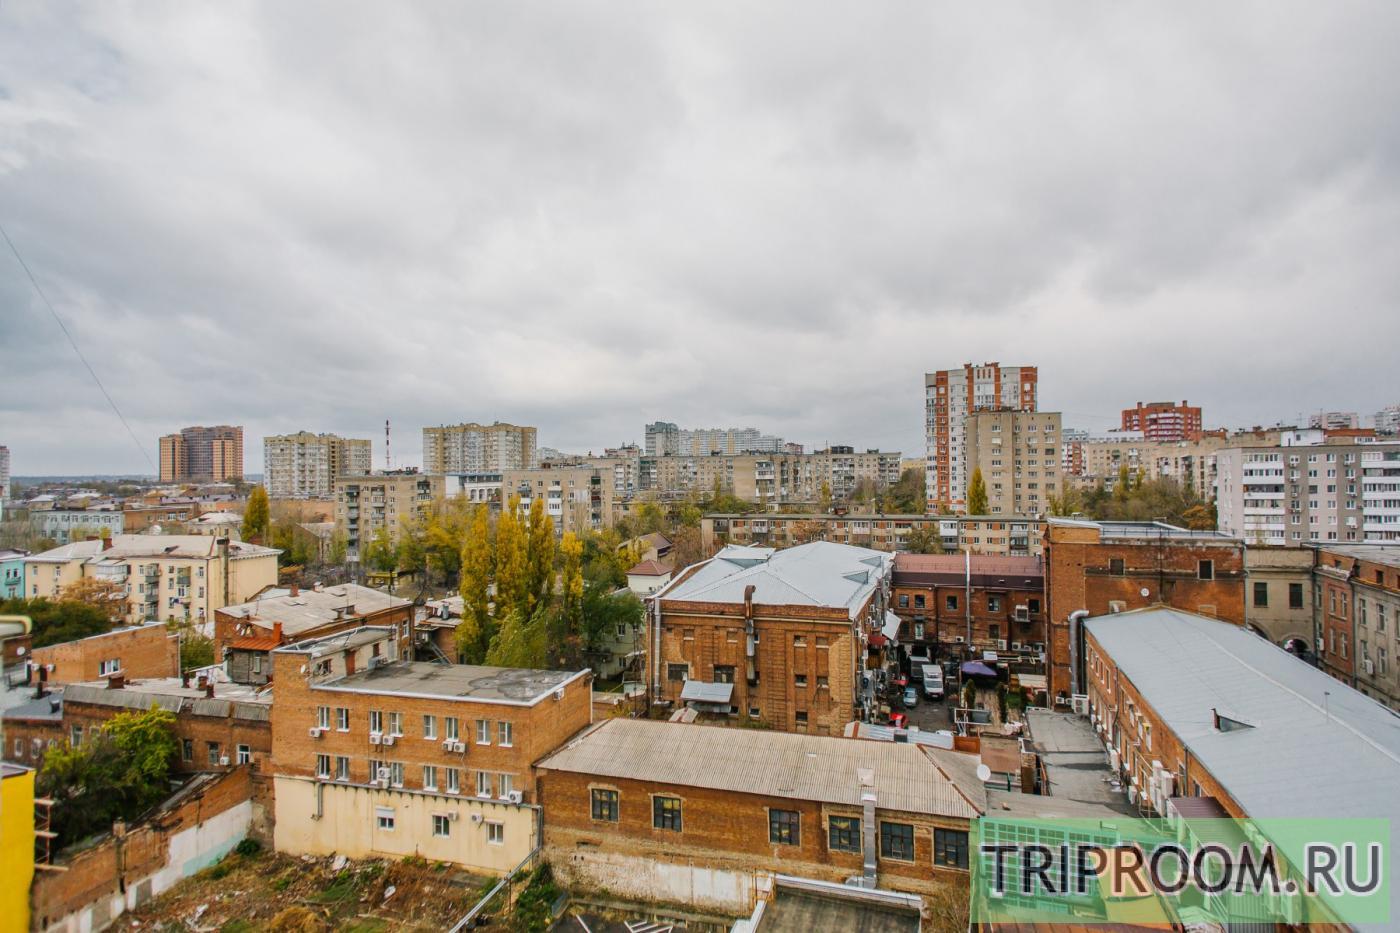 2-комнатная квартира посуточно (вариант № 23730), ул. Максима Горького улица, фото № 15